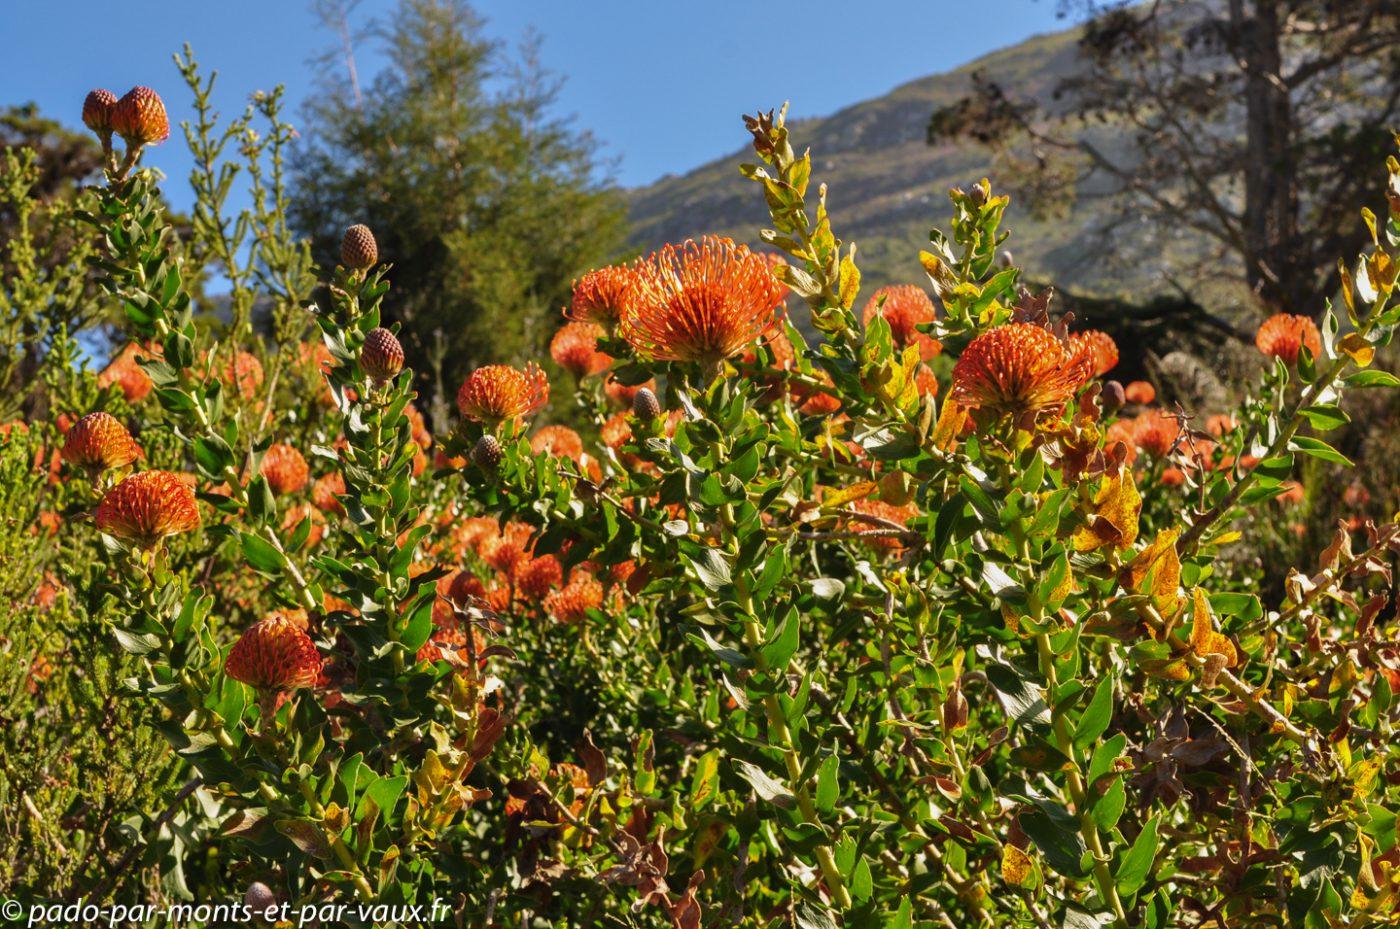 Cape Town - Kirstenbosch Garden